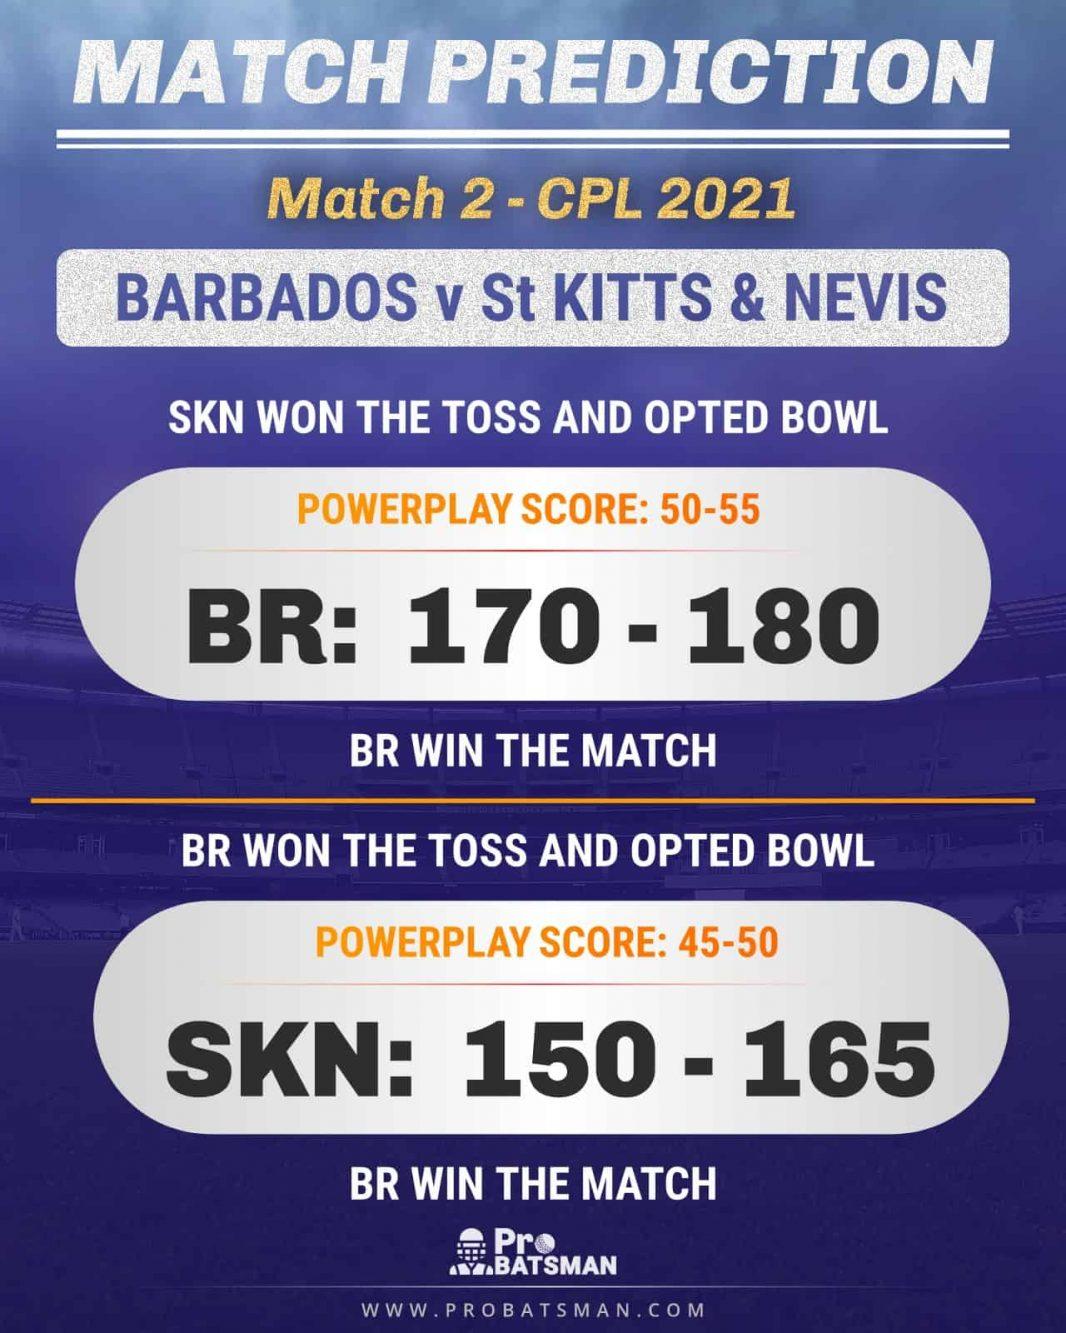 BR vs SKN Match Prediction